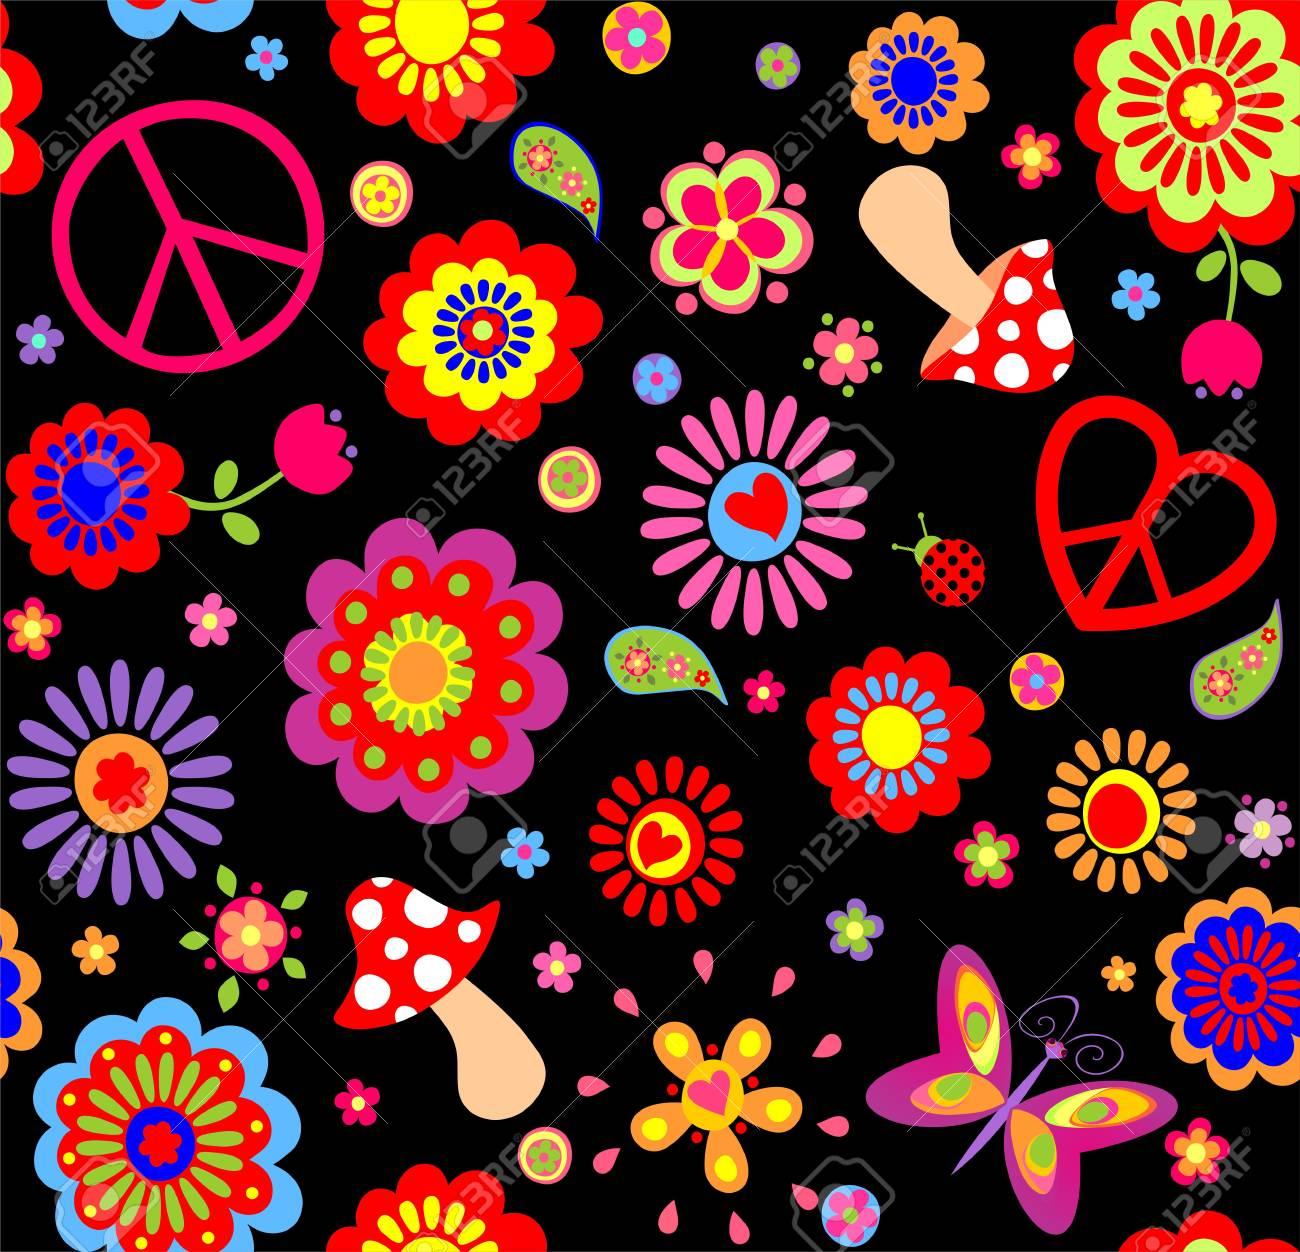 Fondo de flores hippie